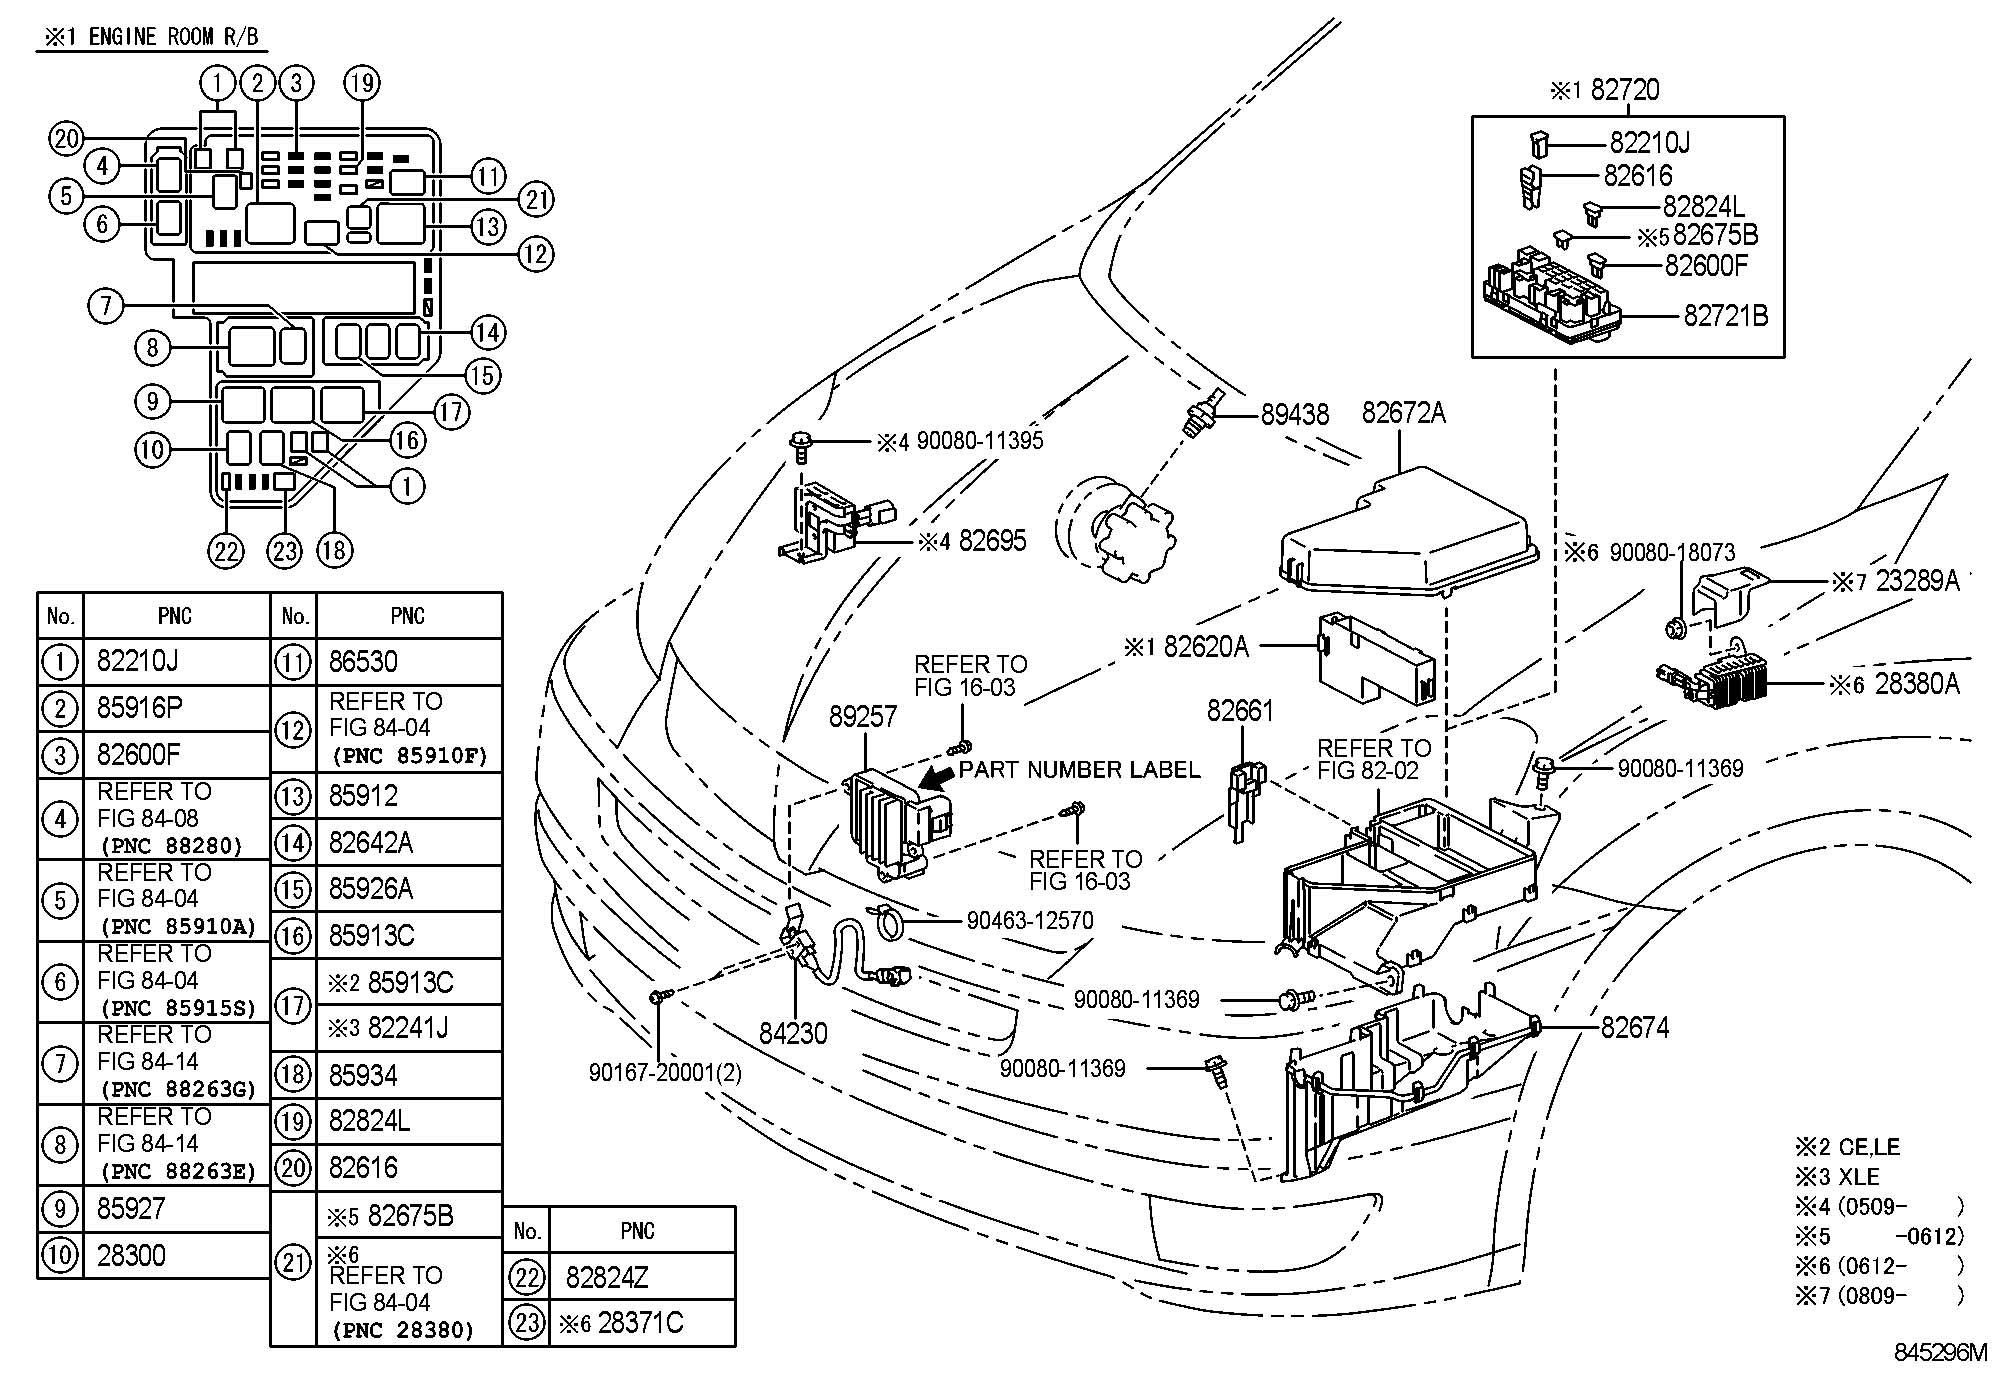 2006 Toyota Sienna Fuse, fuse block; fuse, medium current